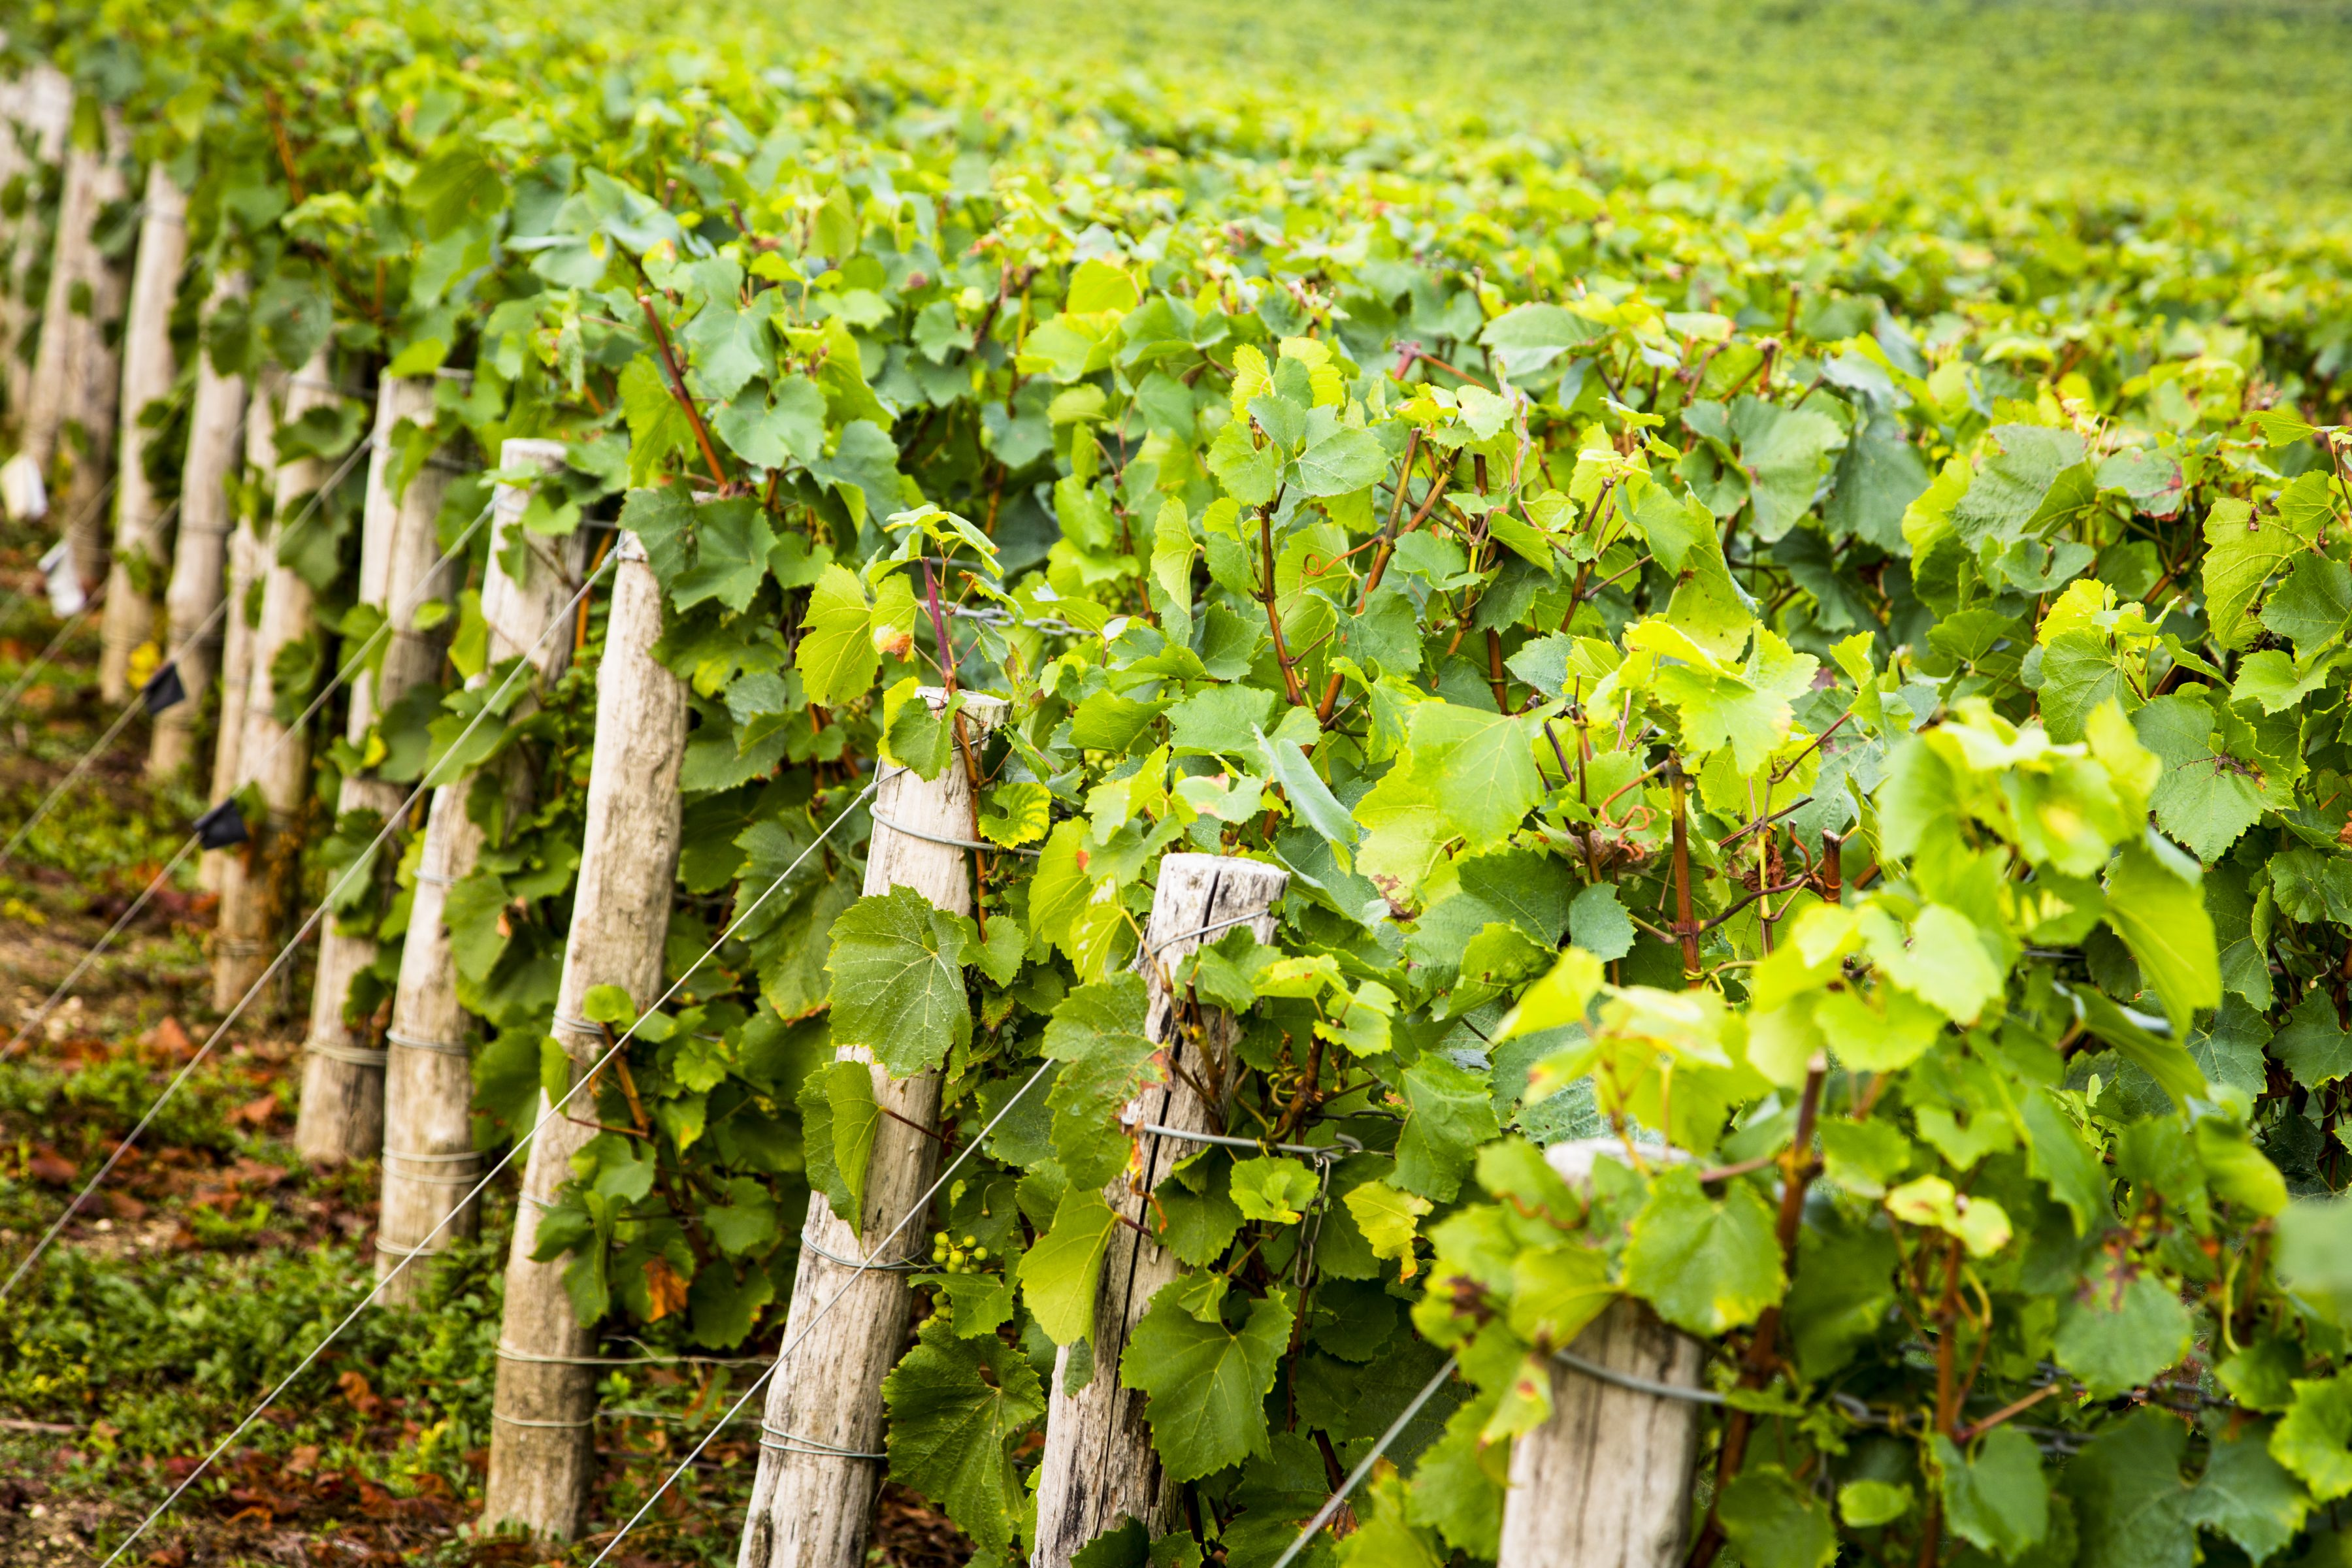 Telmont vineyard